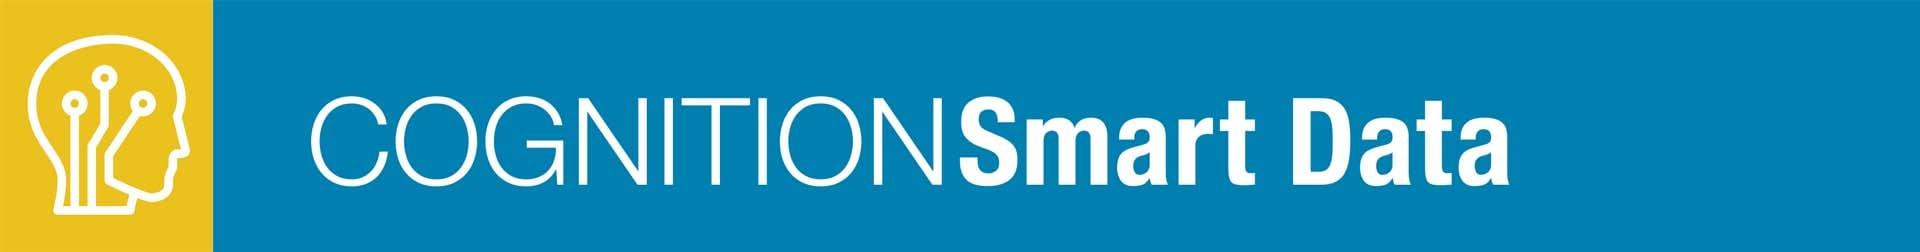 Cognition Smart Data header new 2